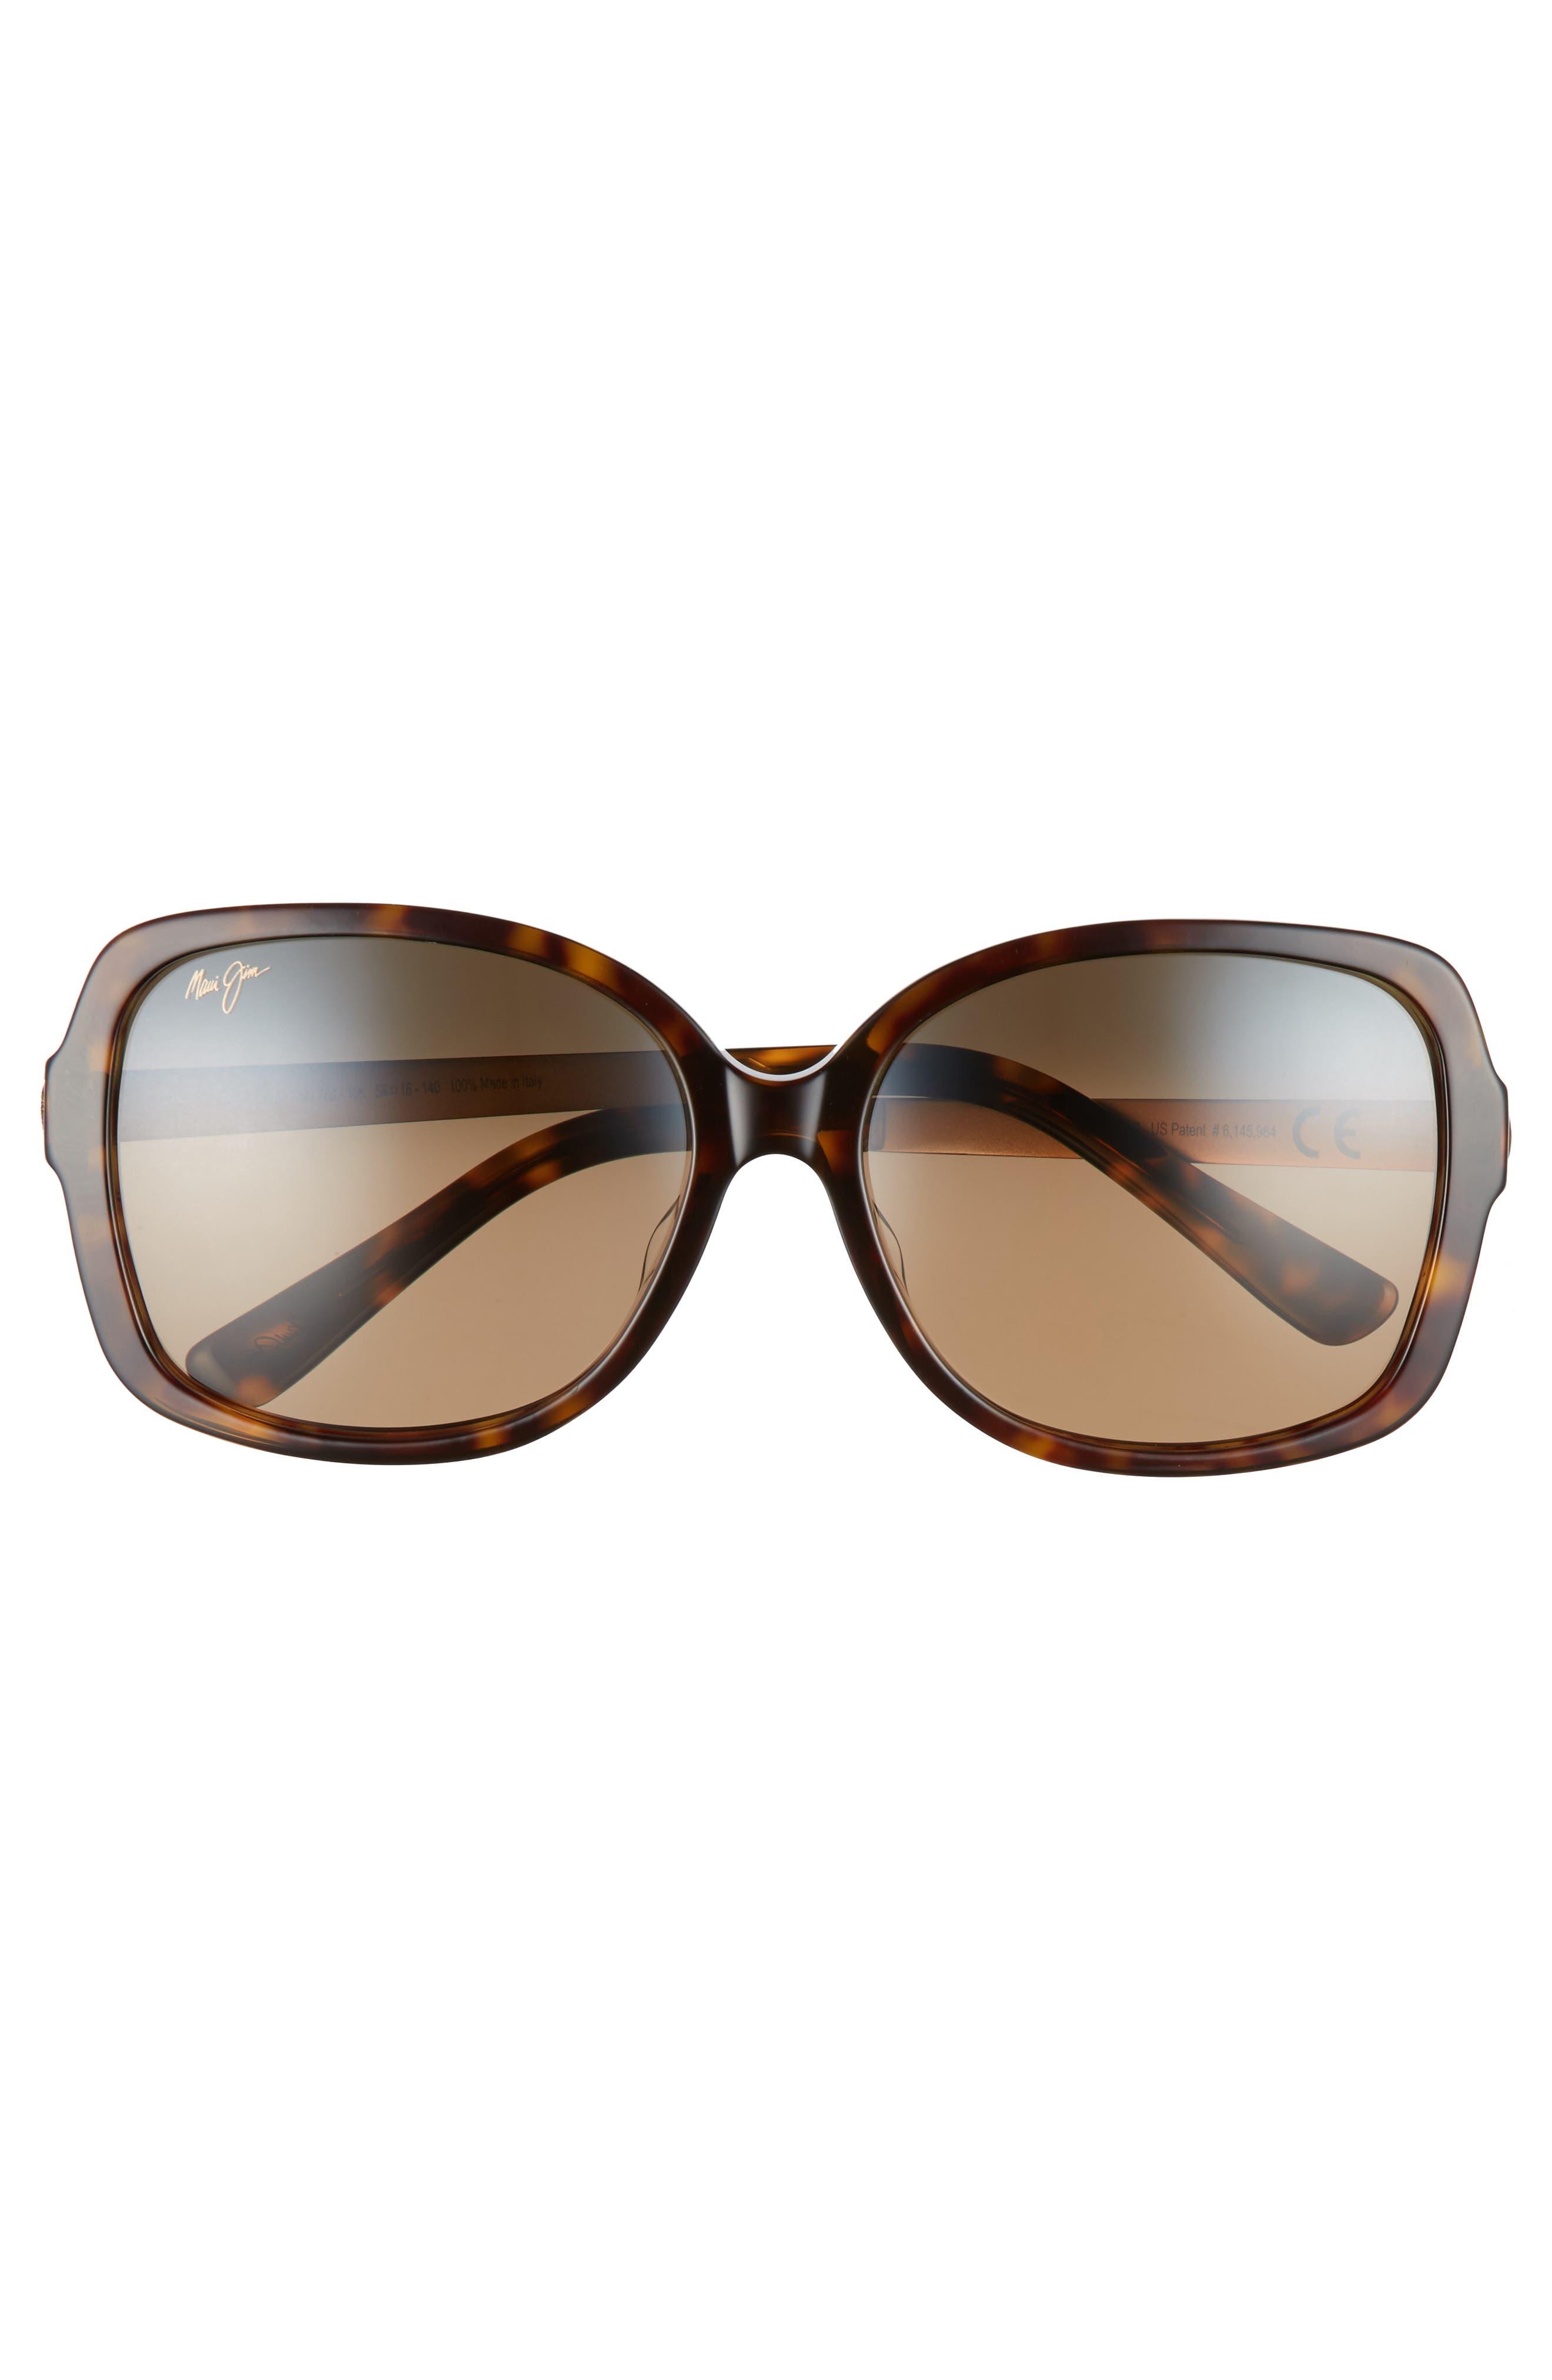 ,                             Melika 58mm Polarized Square Sunglasses,                             Alternate thumbnail 3, color,                             DARK TORTOISE GOLD/ BRONZE